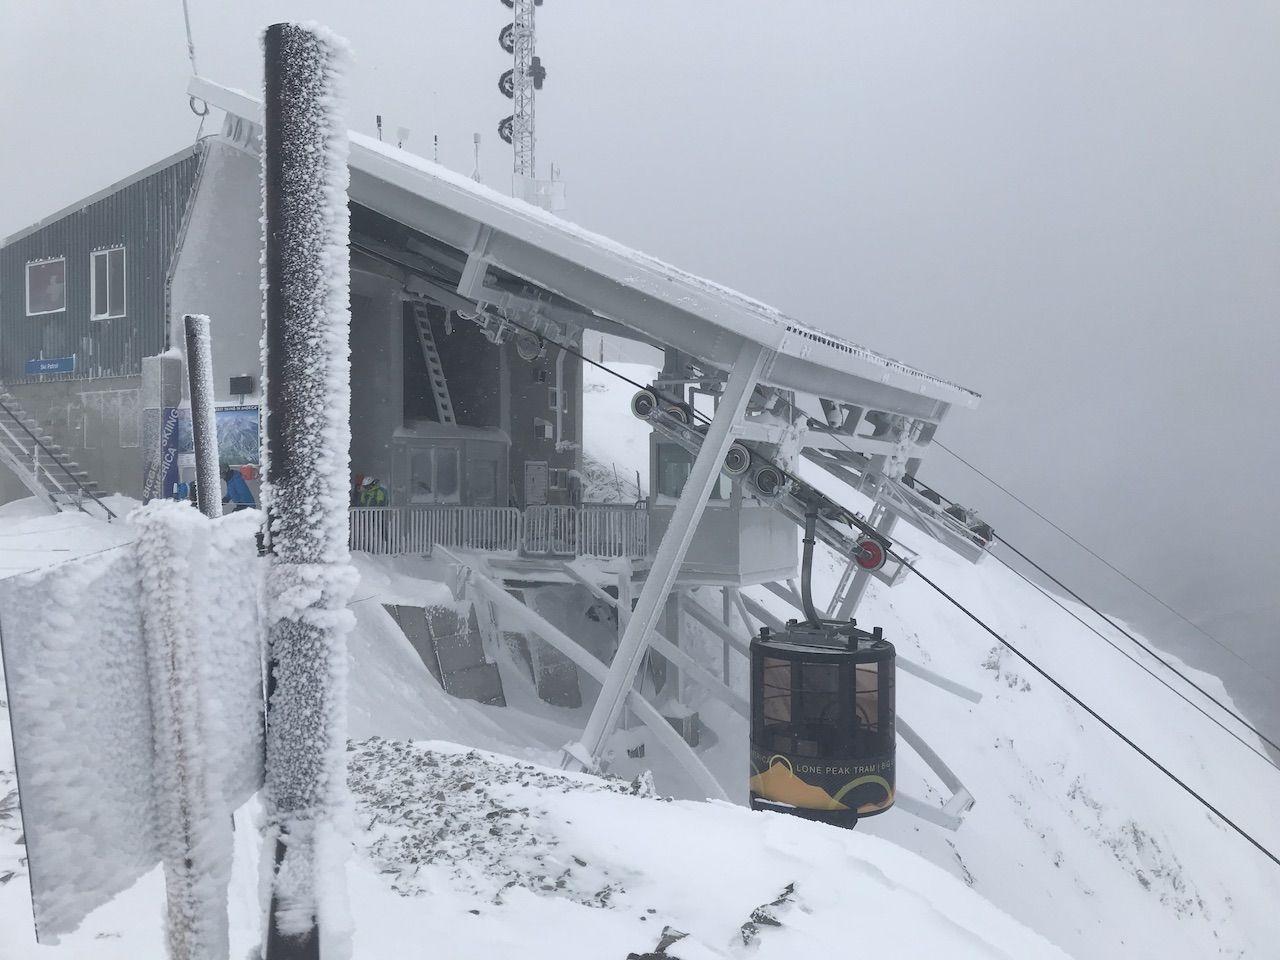 Ski lift at Big Sky Ski Resort